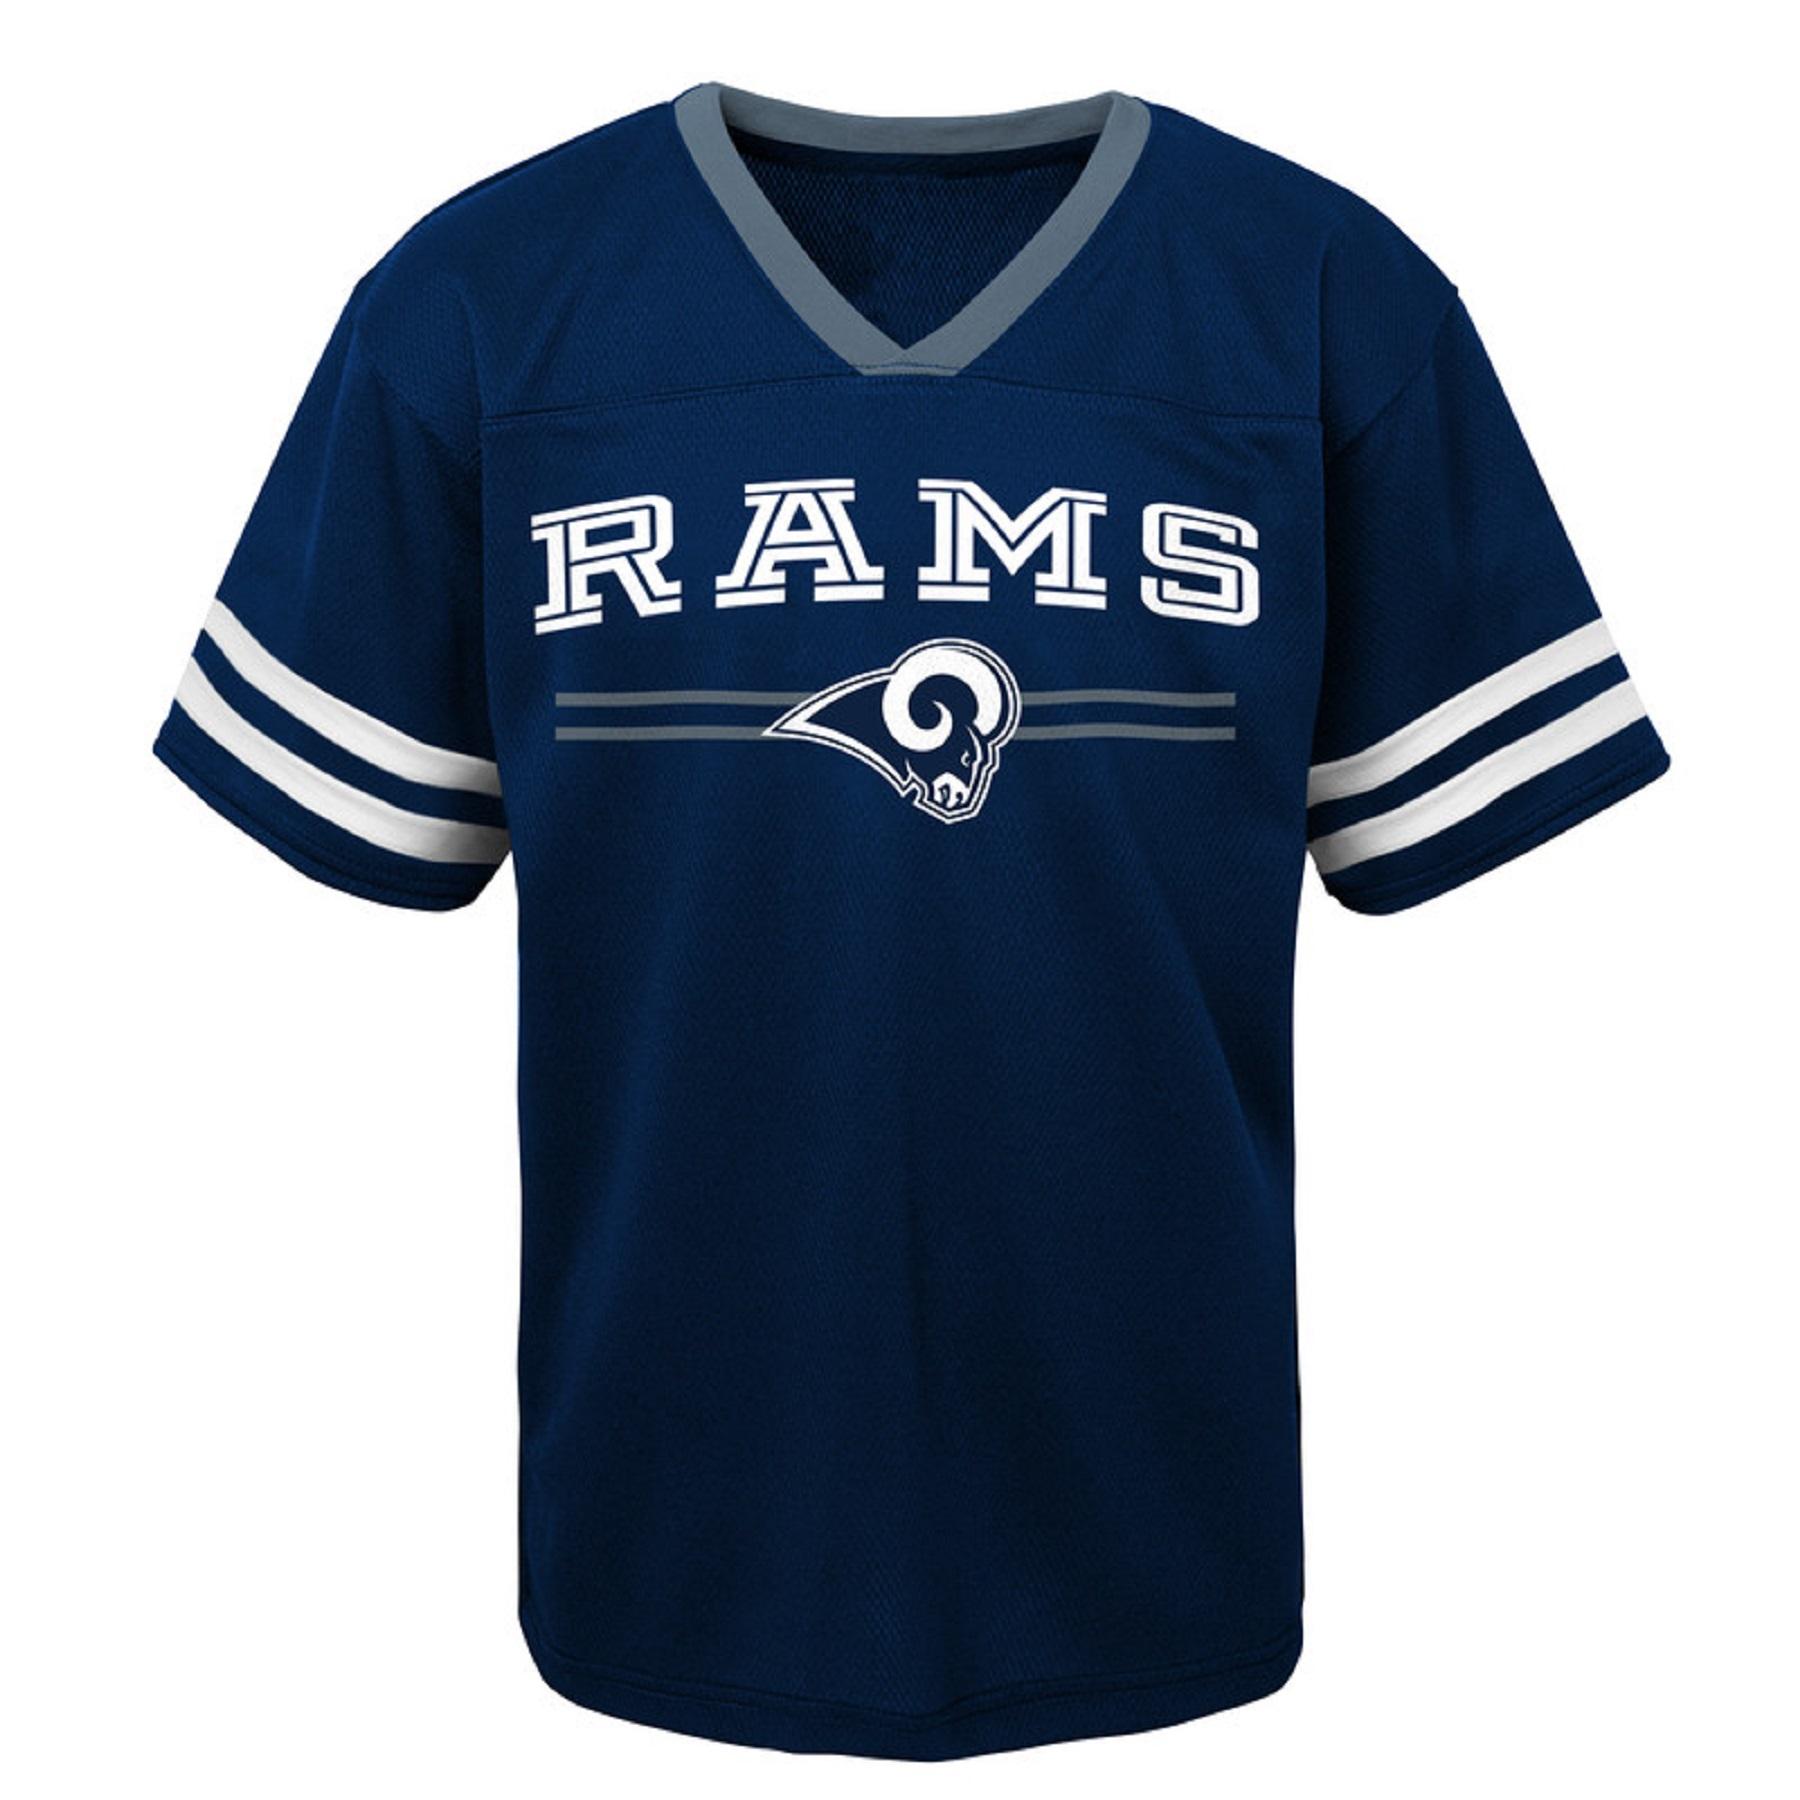 Youth Navy Los Angeles Rams Mesh V-Neck T-Shirt